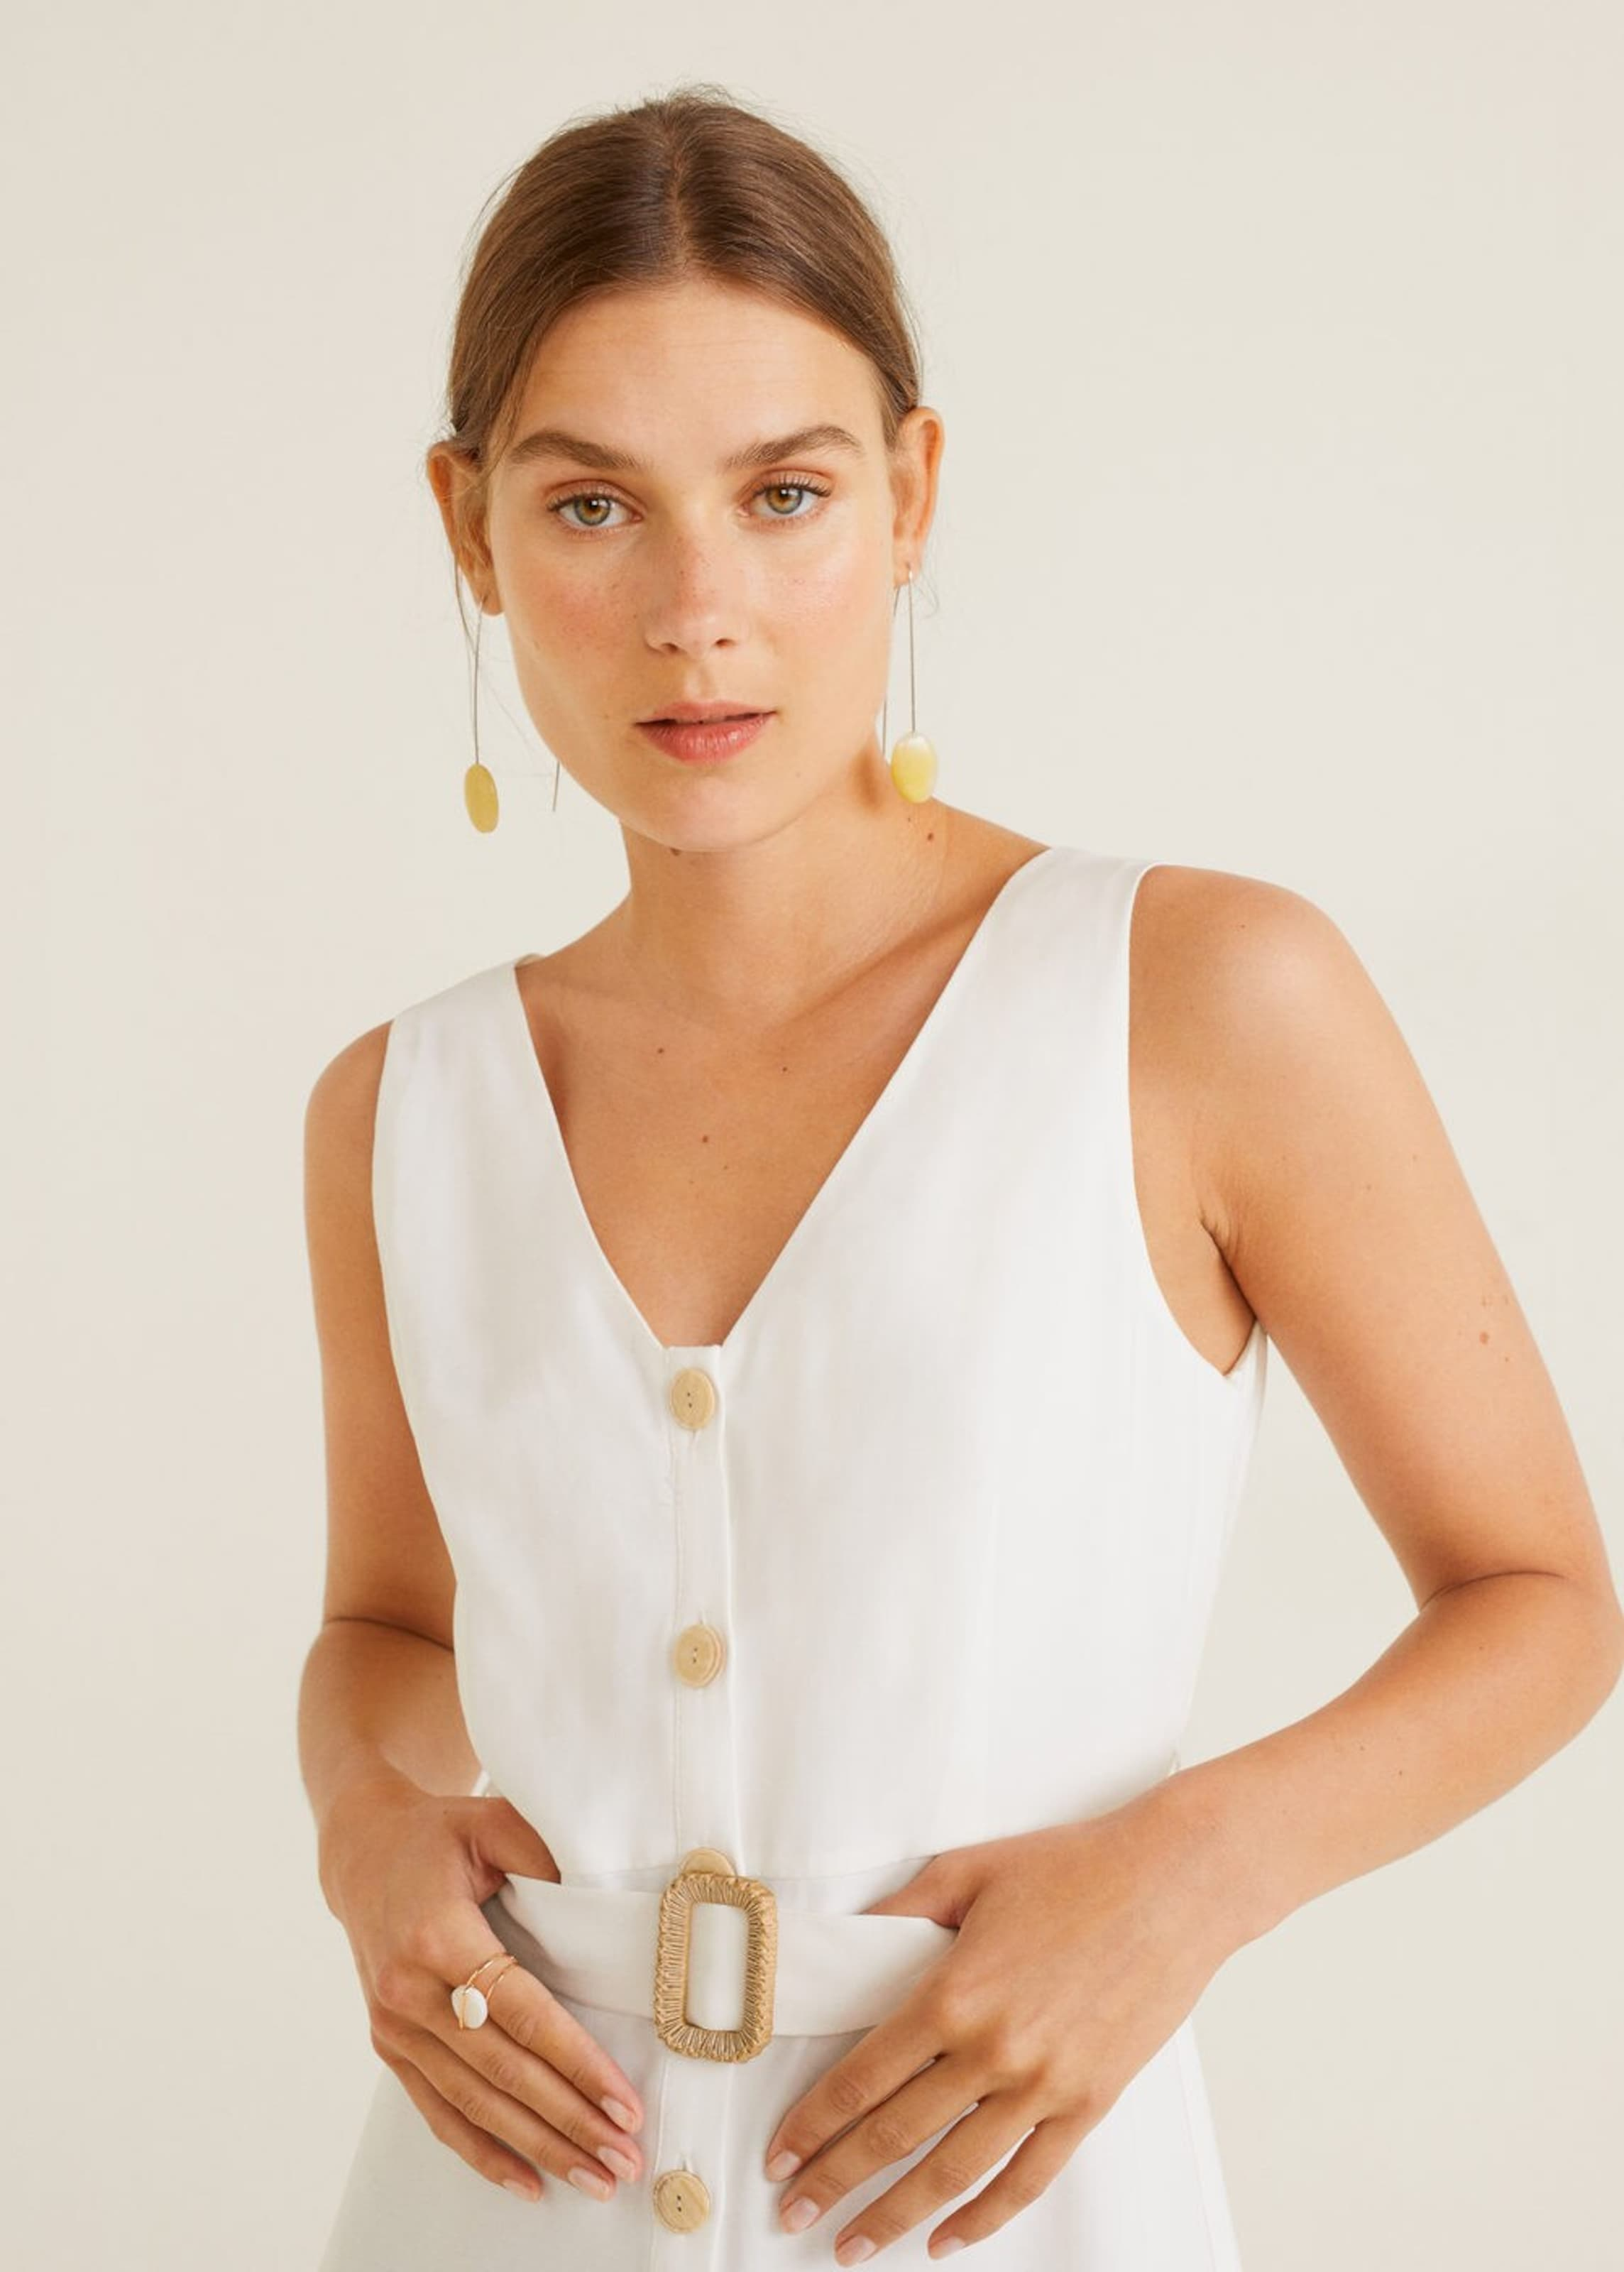 Kleid Mango In In In Kleid Mango Weiß 'selva' 'selva' 'selva' Kleid Weiß Mango ikXuTwOZP